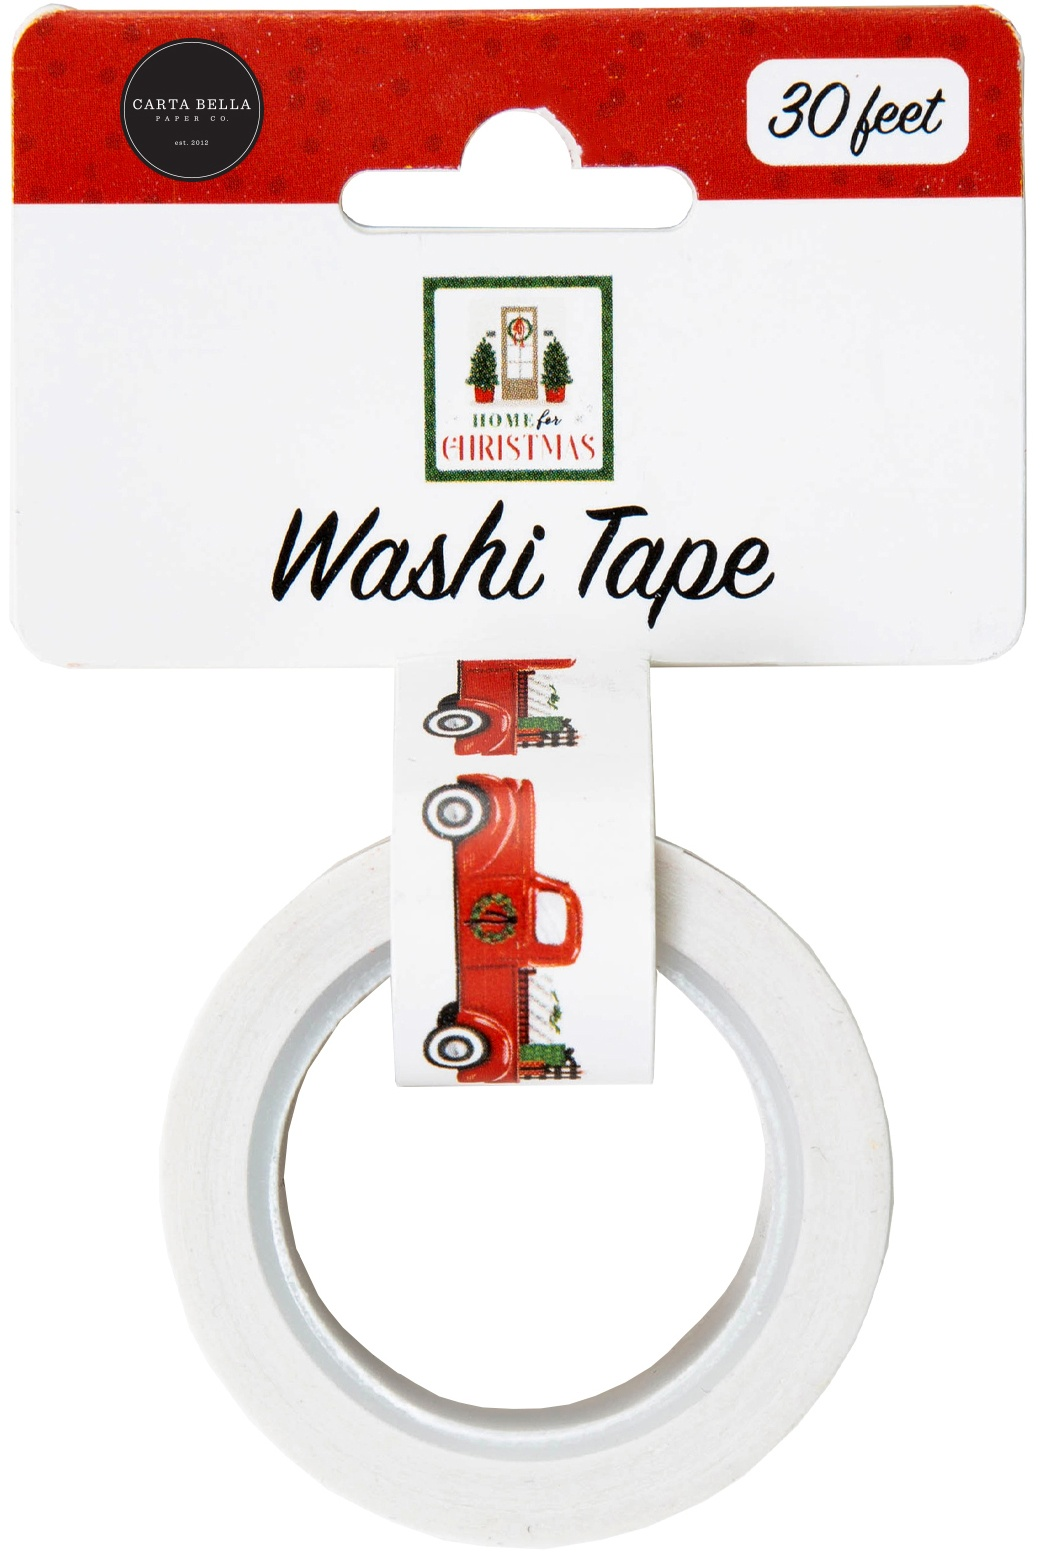 Carta Bella Home For Christmas Washi Tape 30'-Christmas Trucks